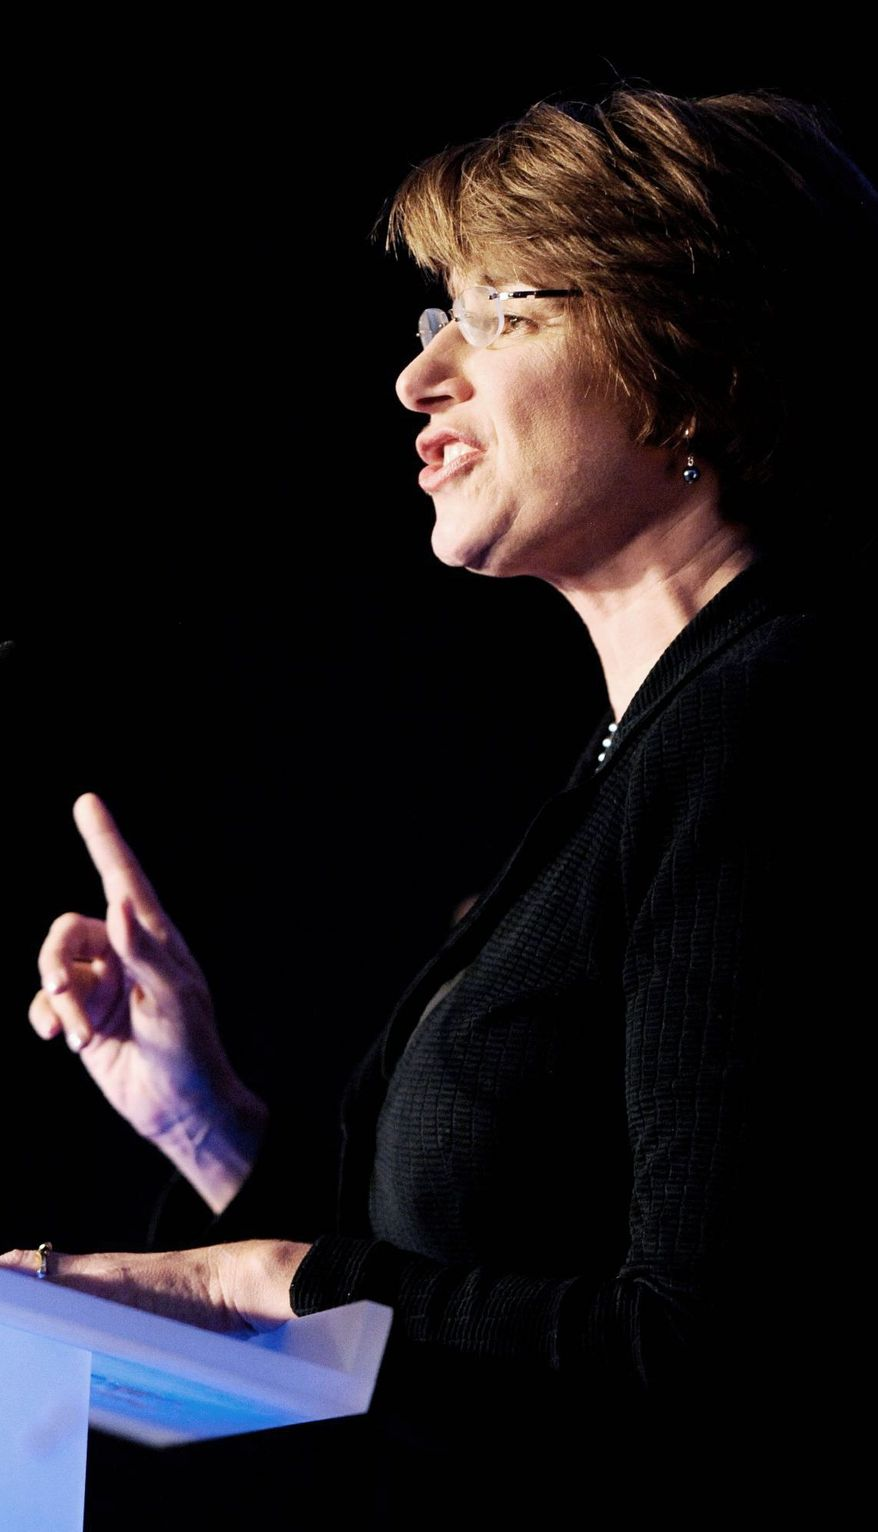 U.S. Sen. Amy Klobuchar, Minnesota Democrat, addresses supporters Tuesday night. With a Democratic governor and Democrats in control of the Legislature, Minnesota is heavily blue. (Associated Press)